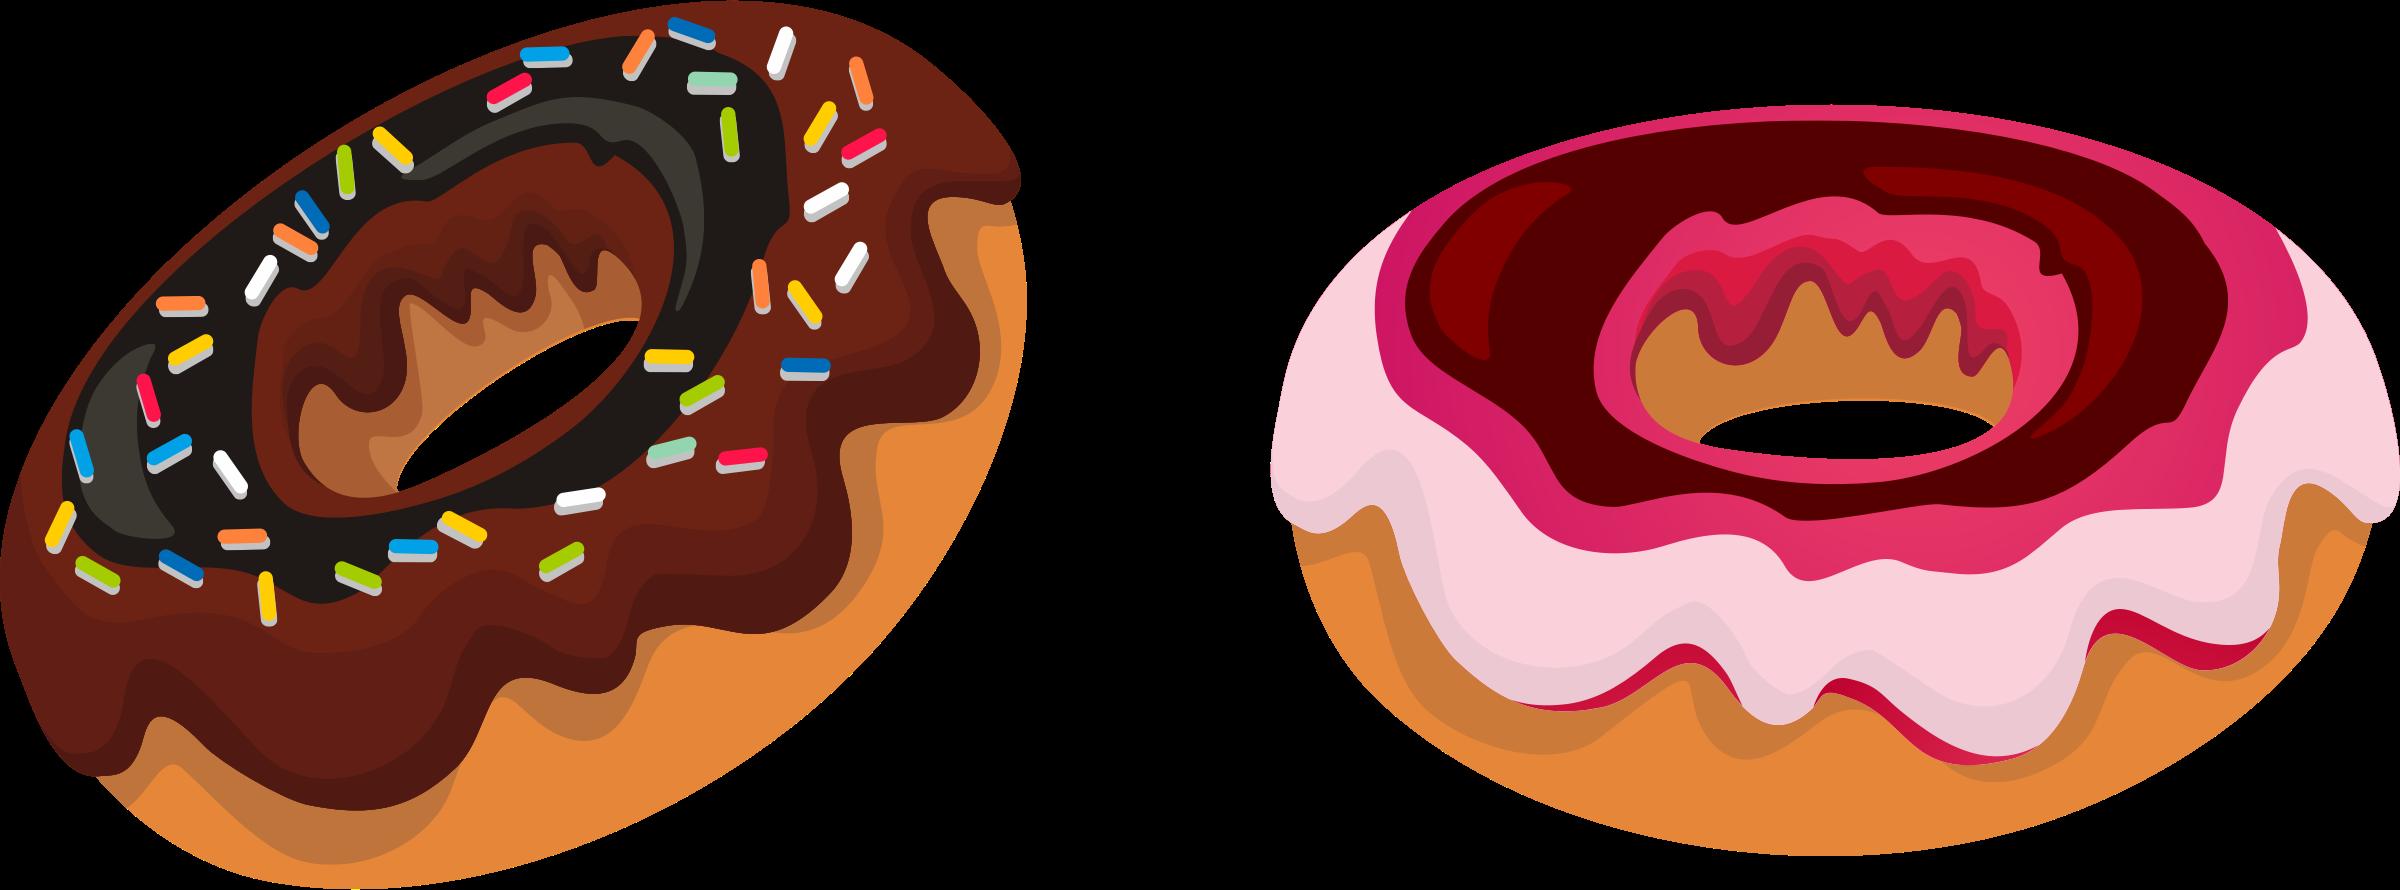 clipart donut-clipart donut-12